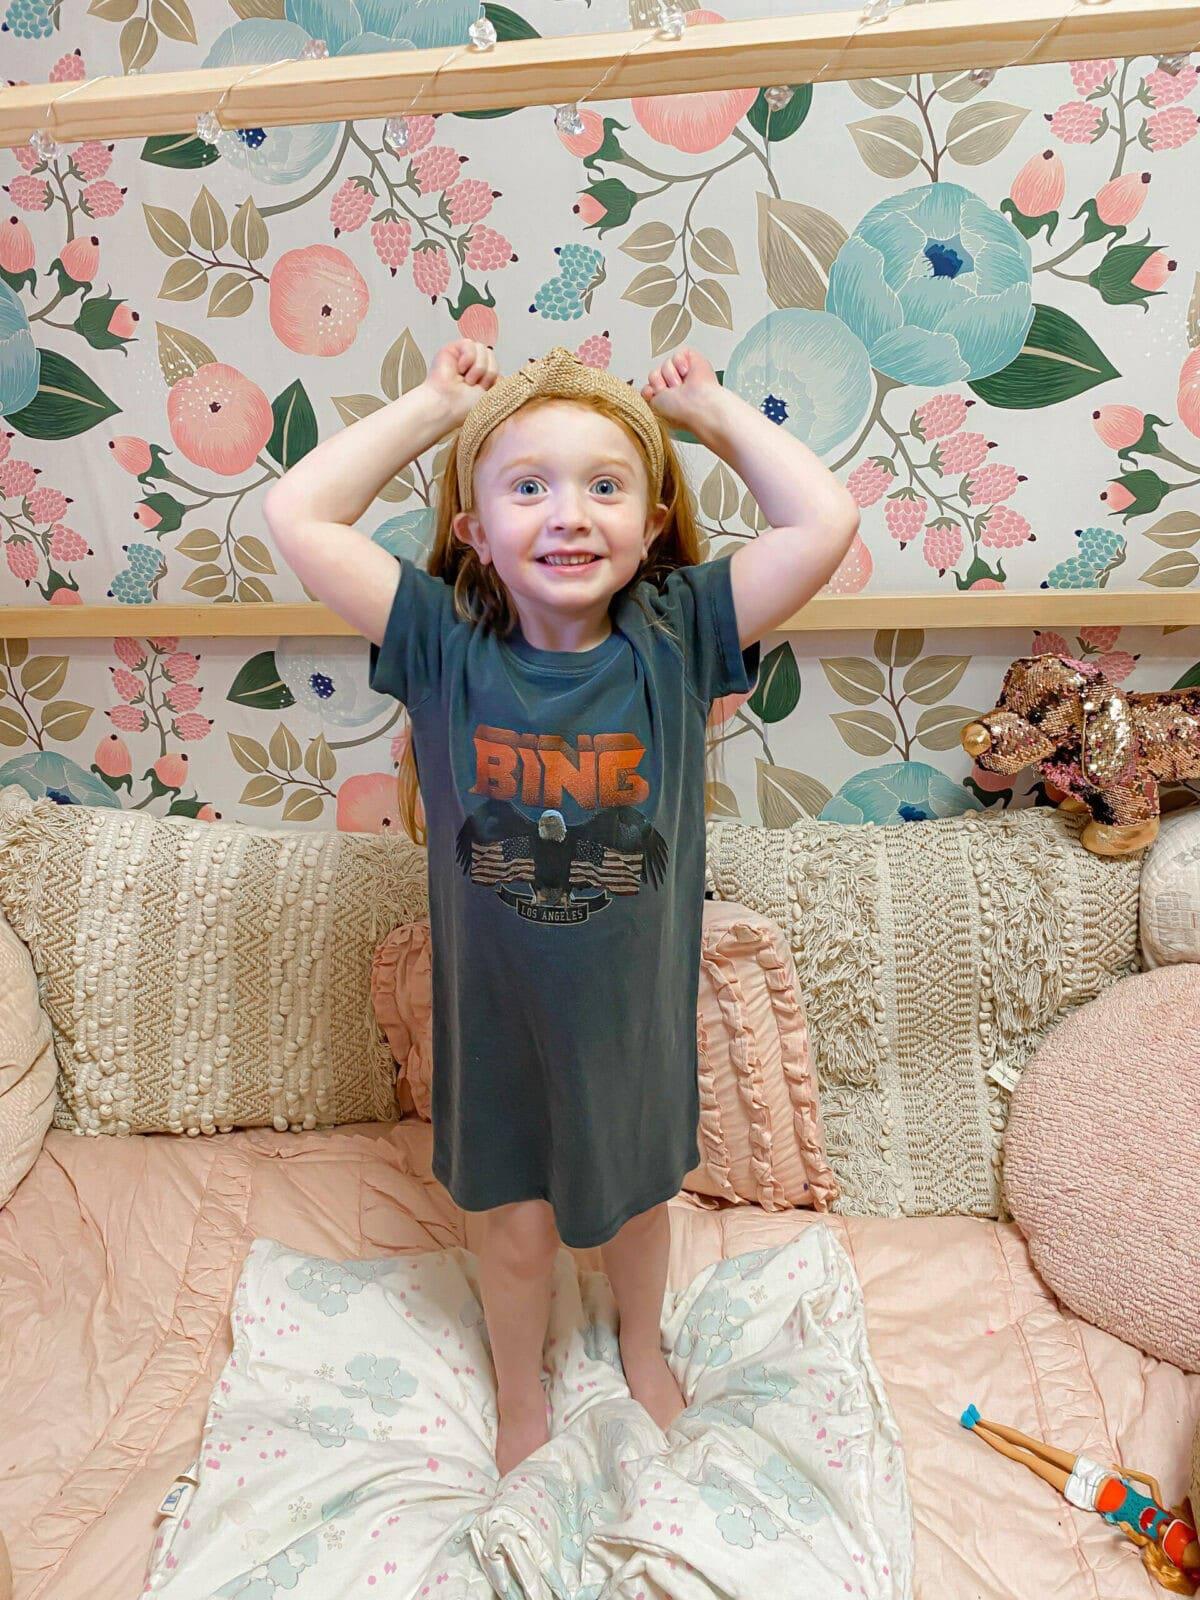 anine bing kids tee shirt dress